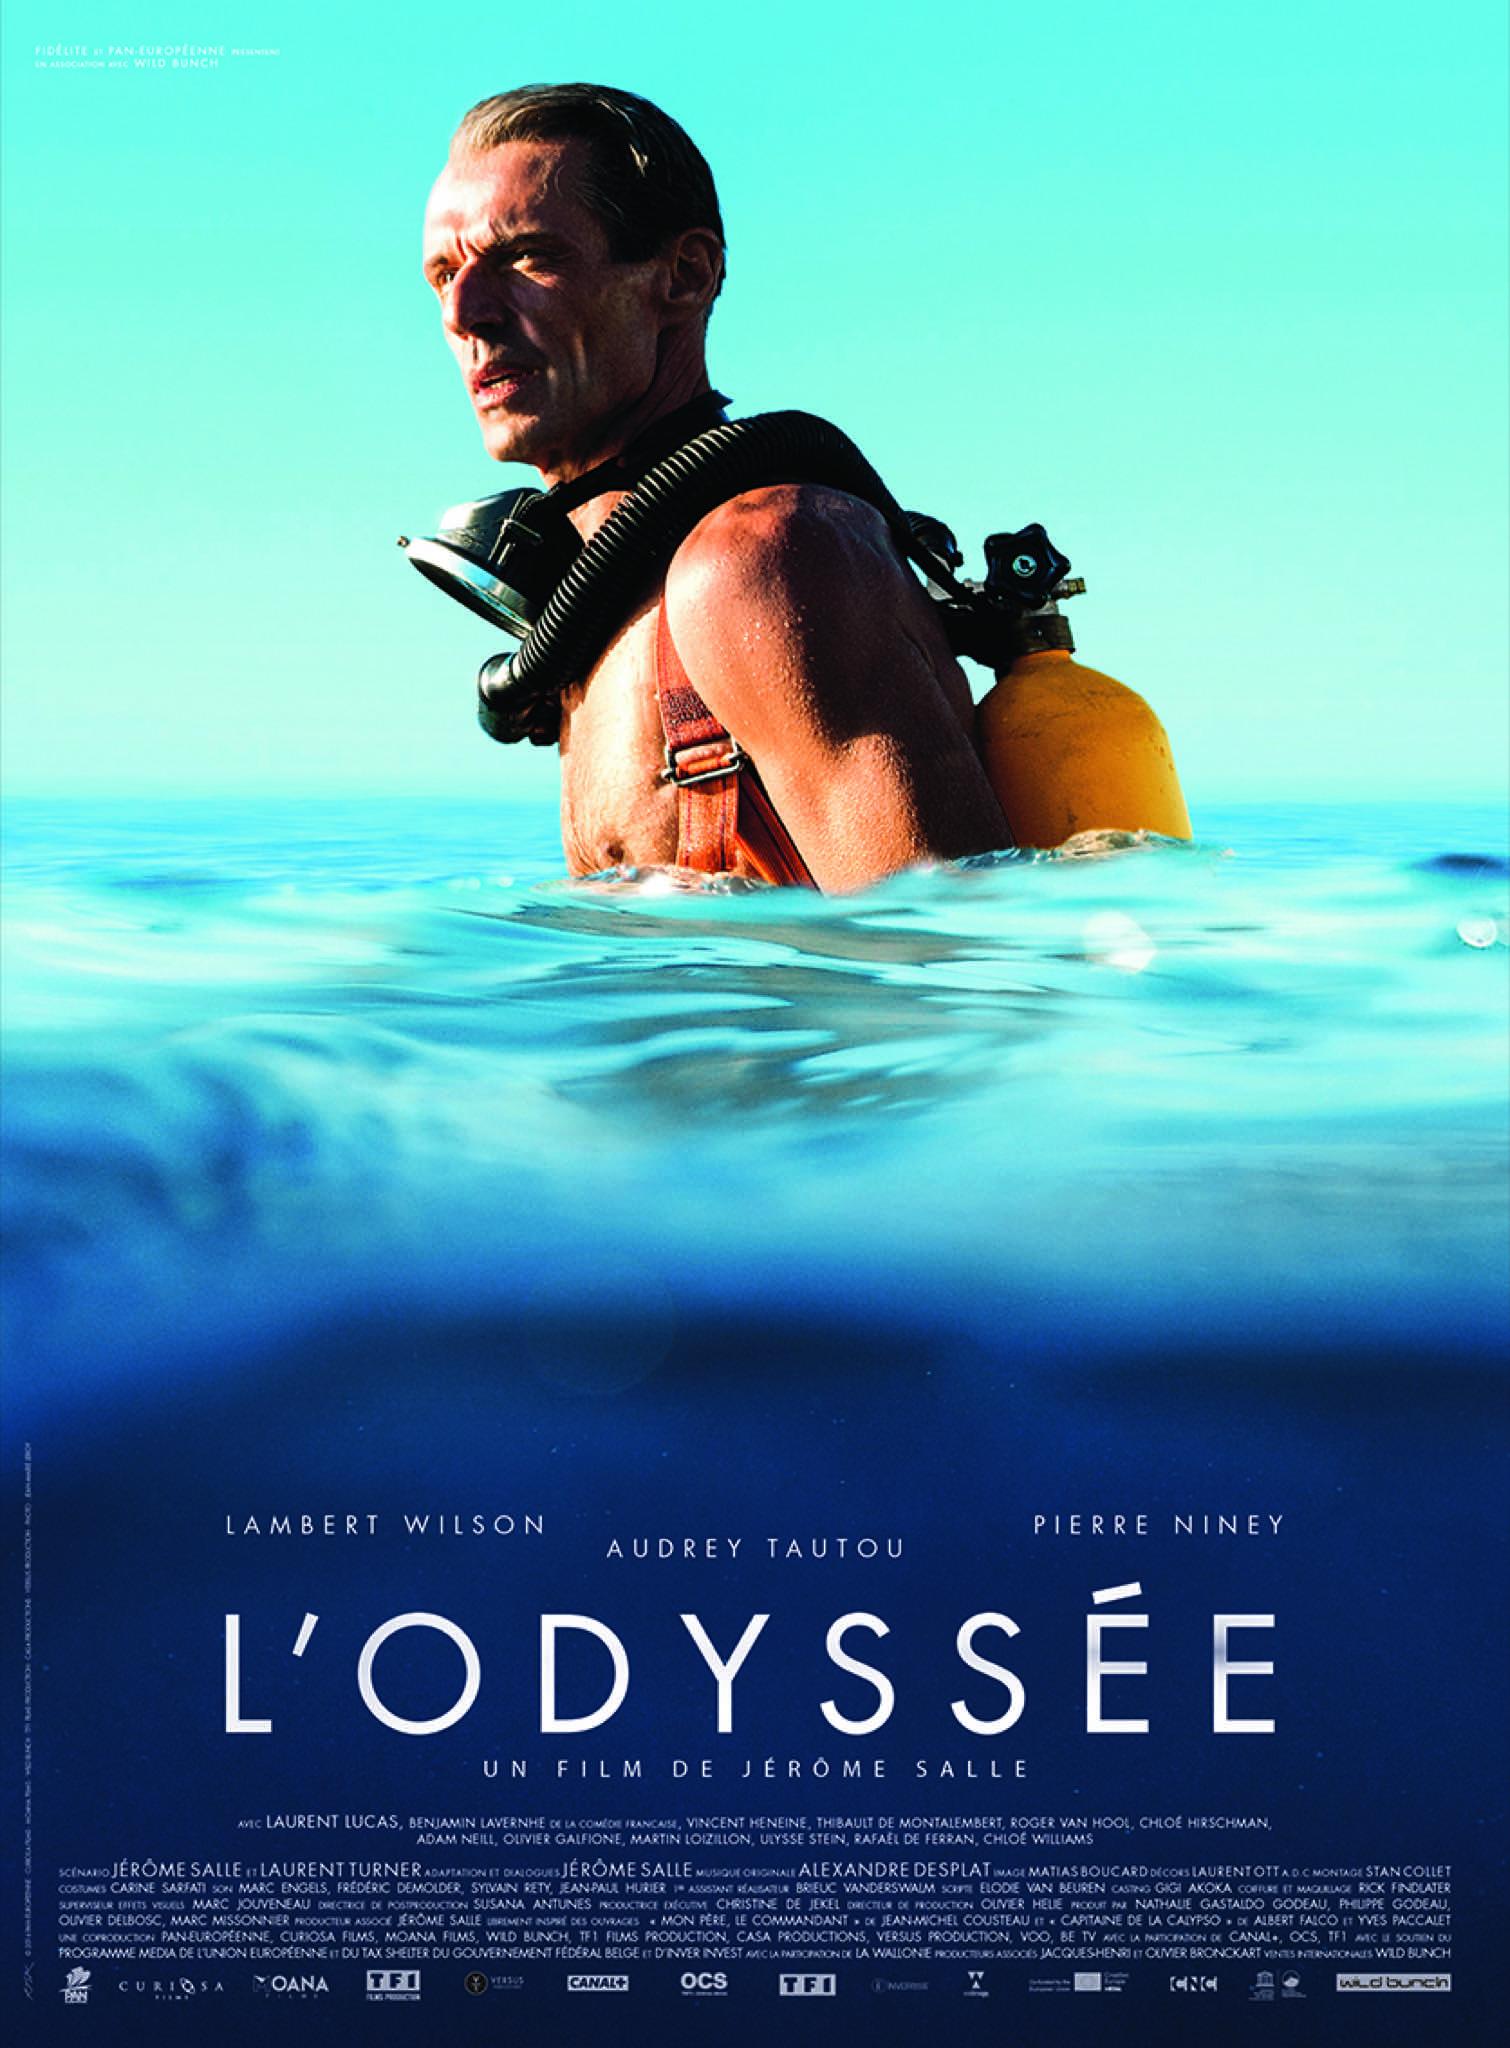 lodyssee-affiche-personnage-lambert-wilson